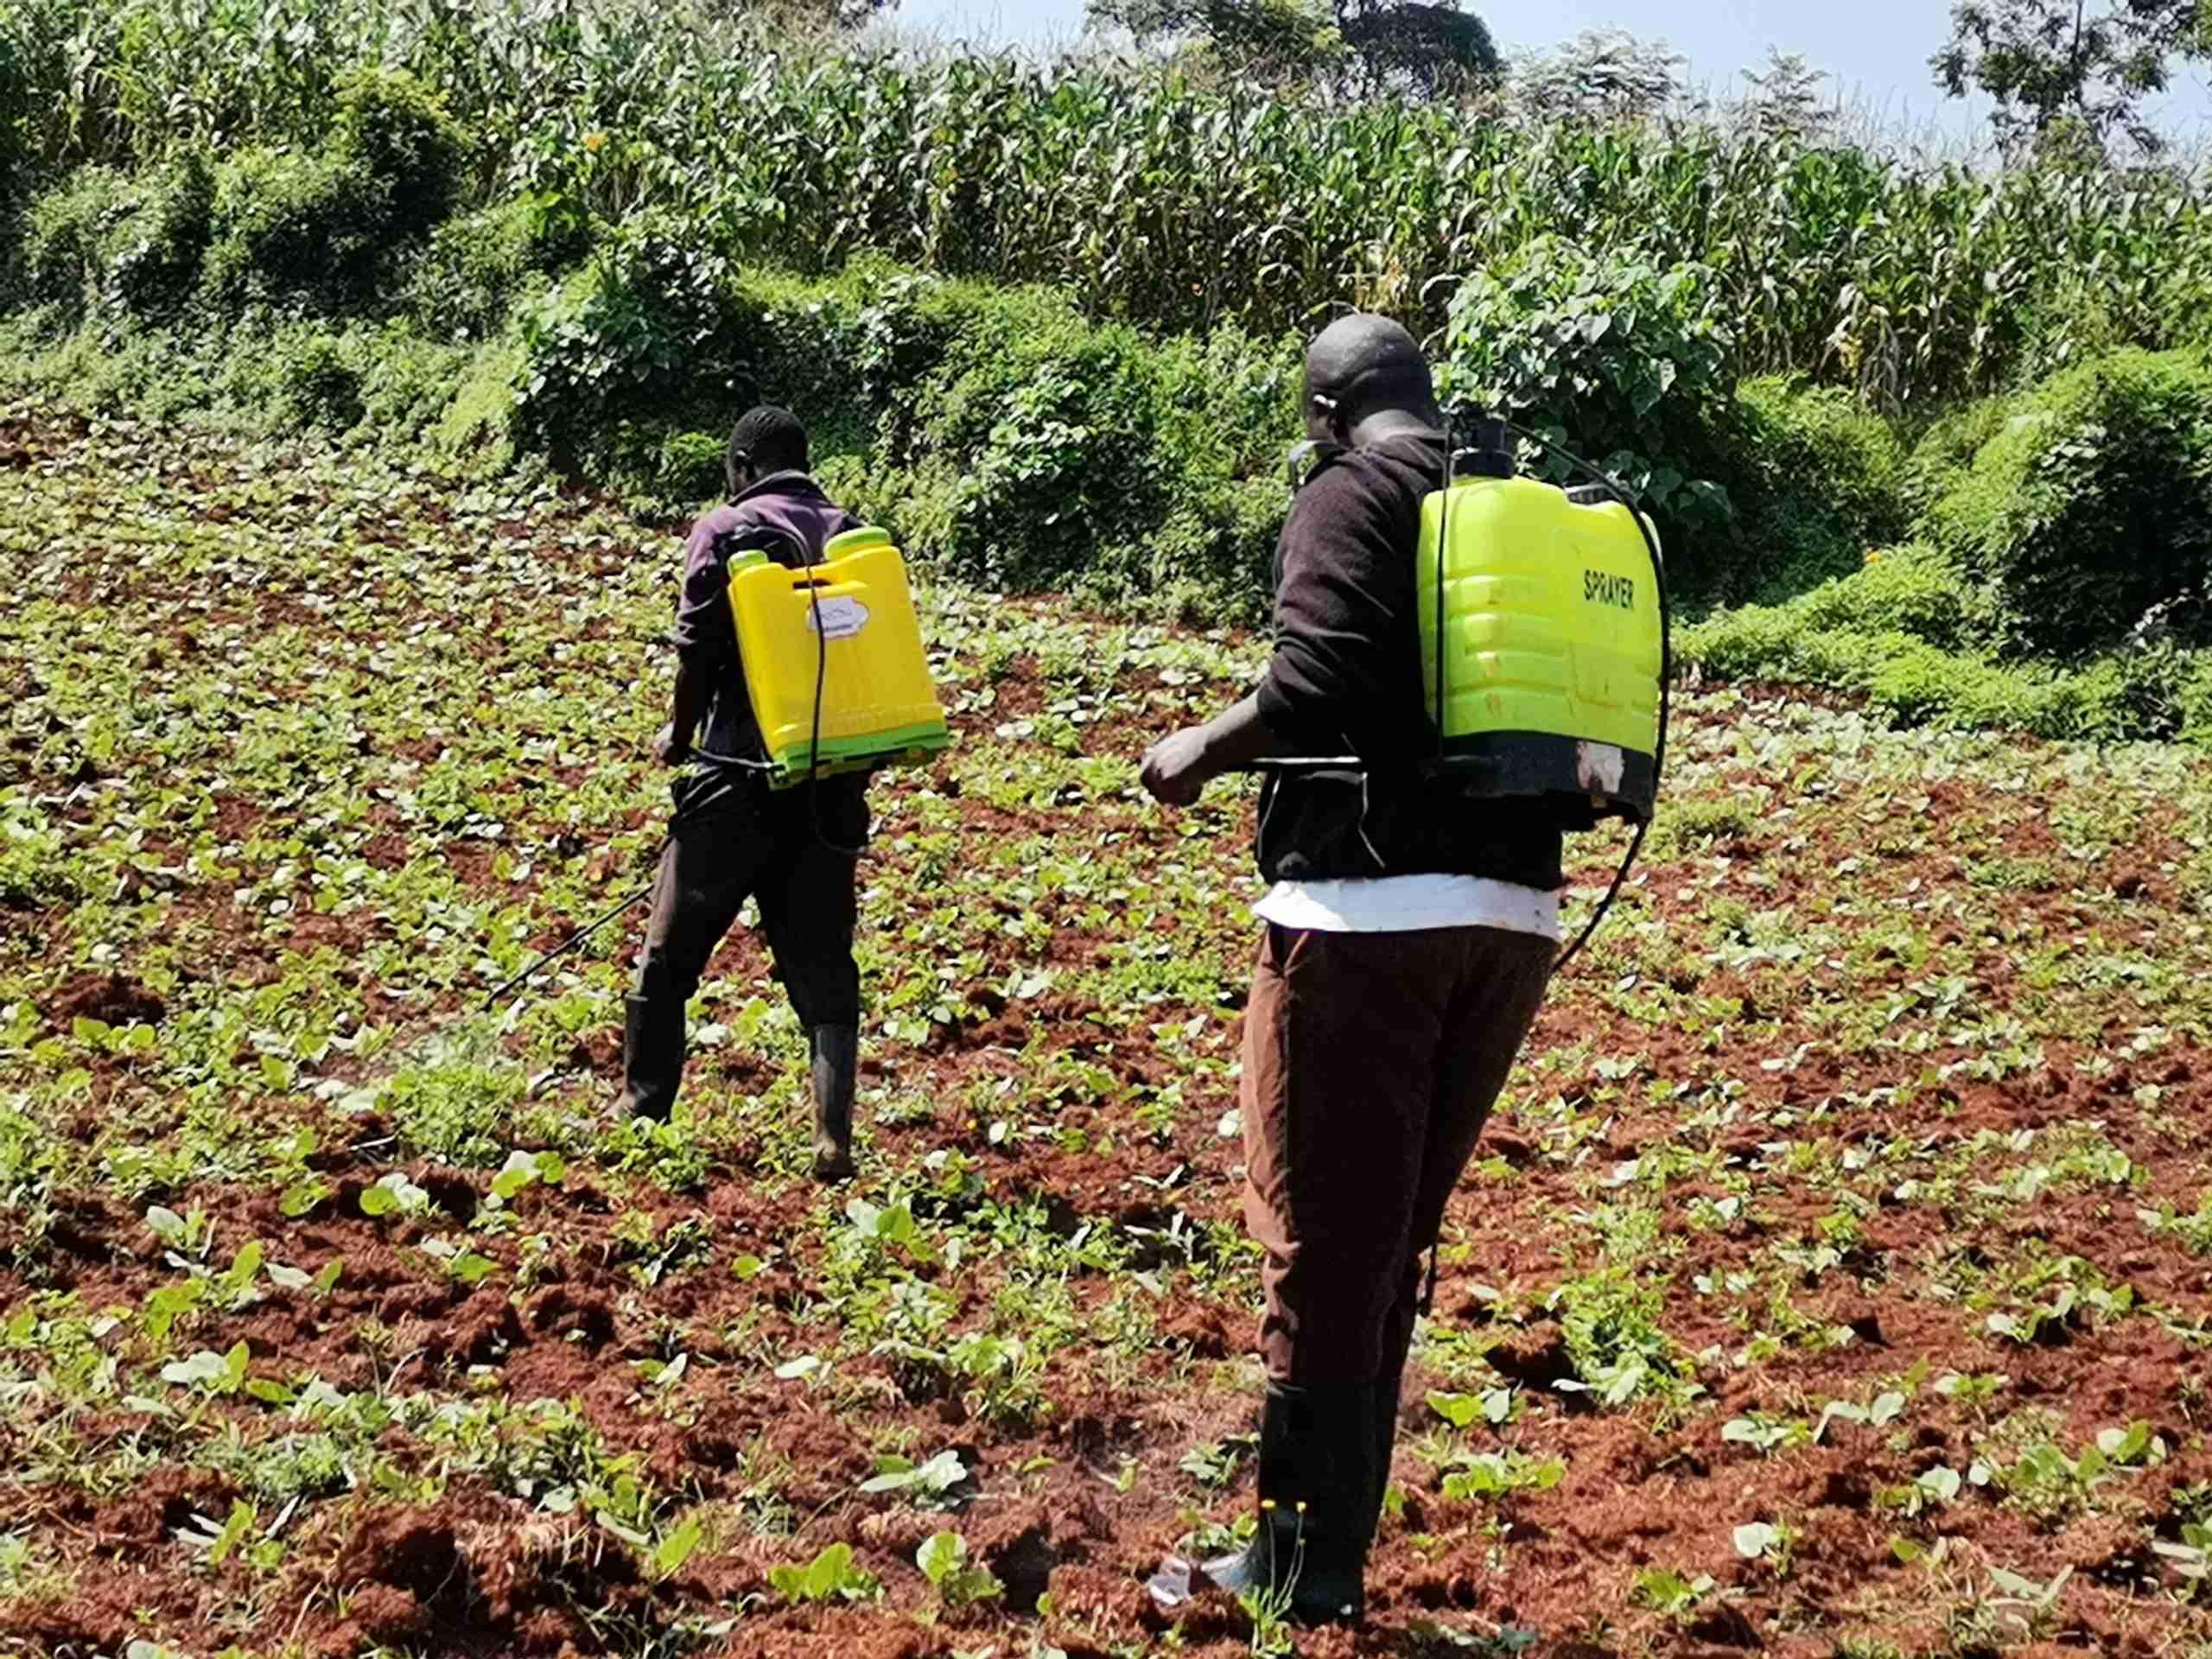 Application of bean herbicide using knapsacks